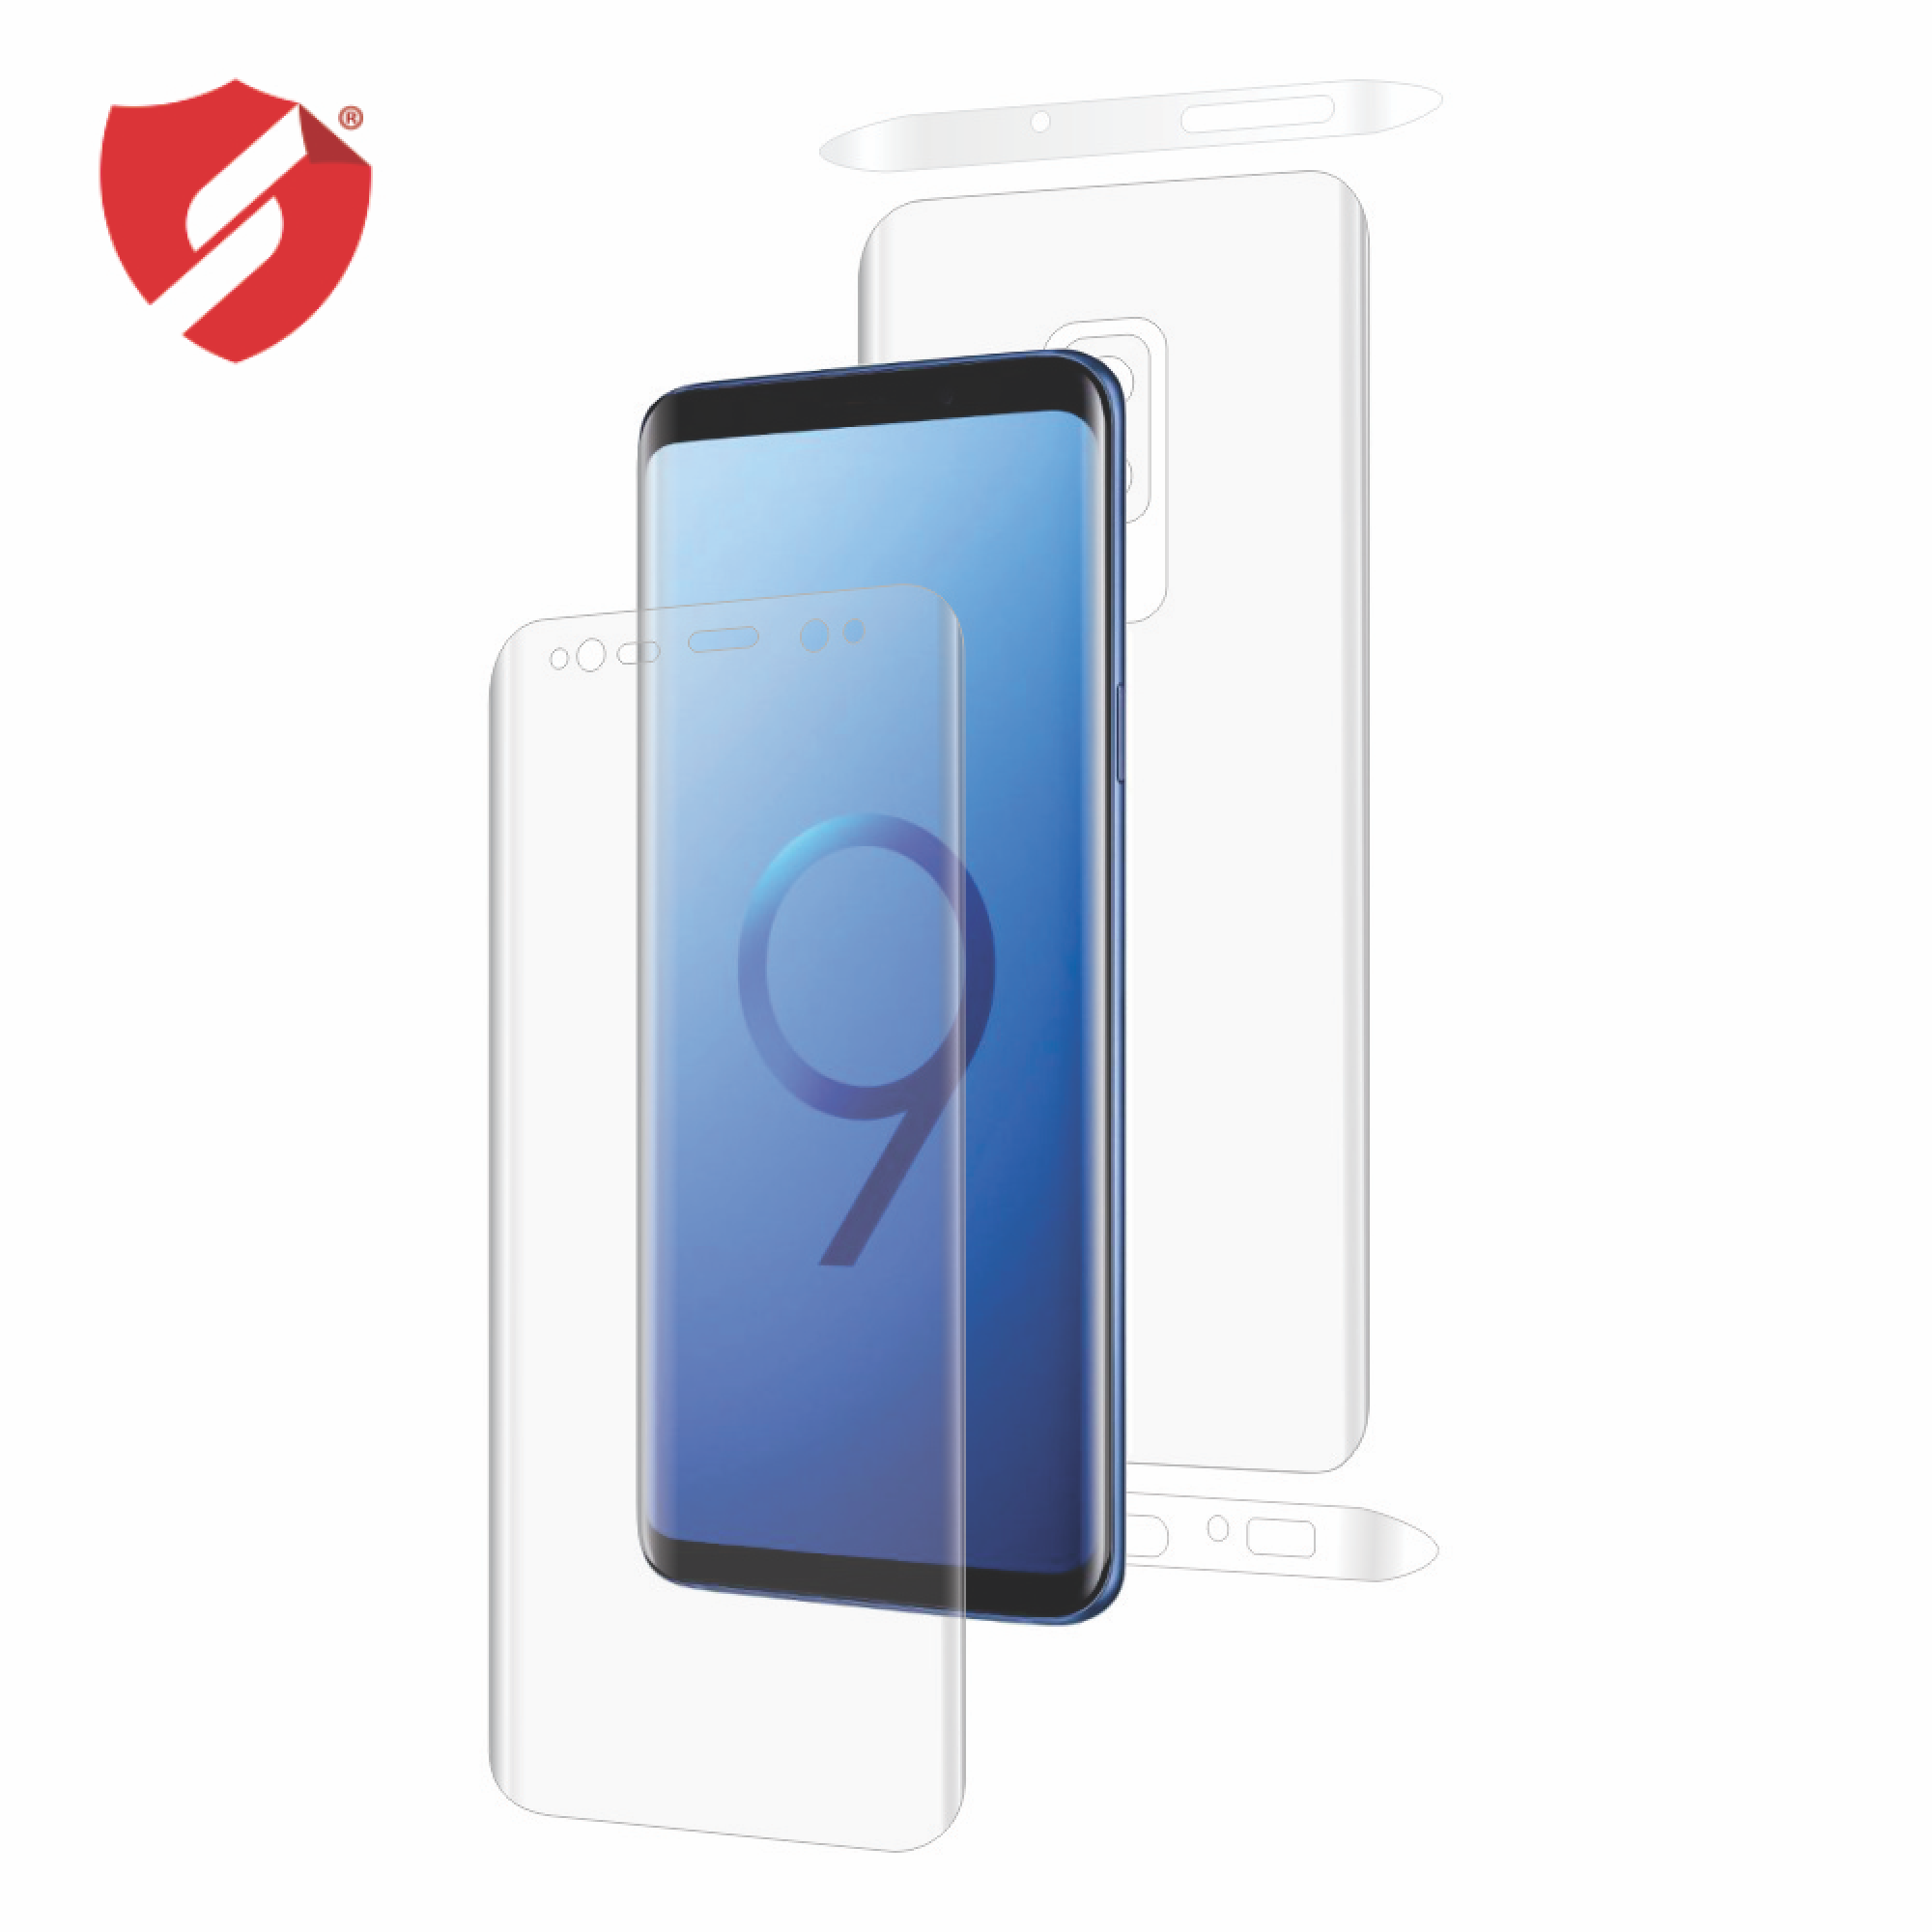 Folie de protectie Smart Protection Samsung Galaxy S9 Plus compatibila cu carcasa UAG - fullbody - display + spate + laterale imagine